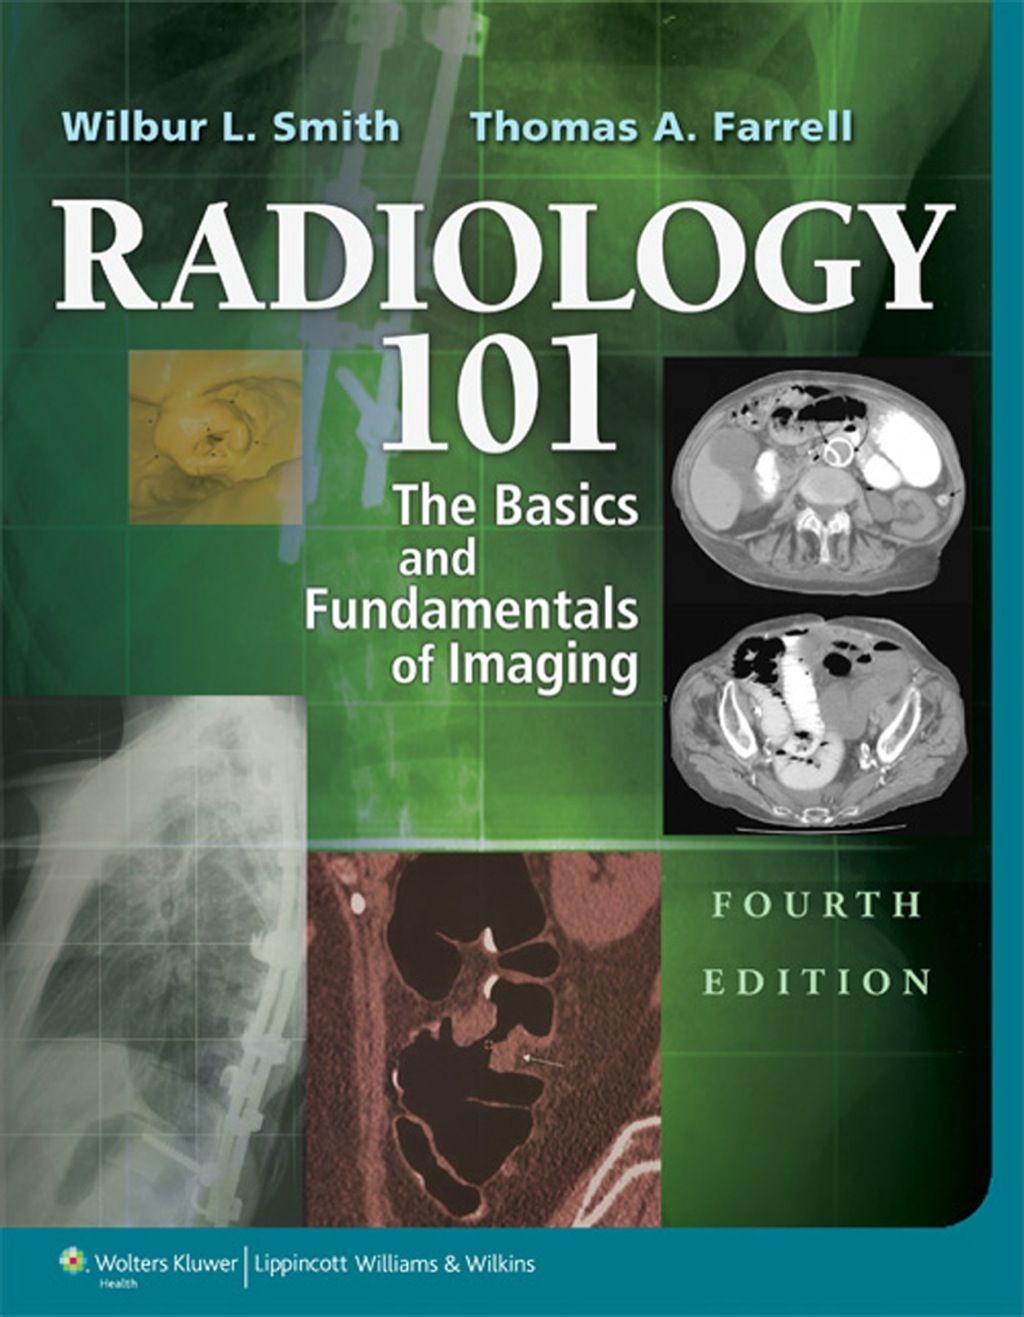 radiology-101